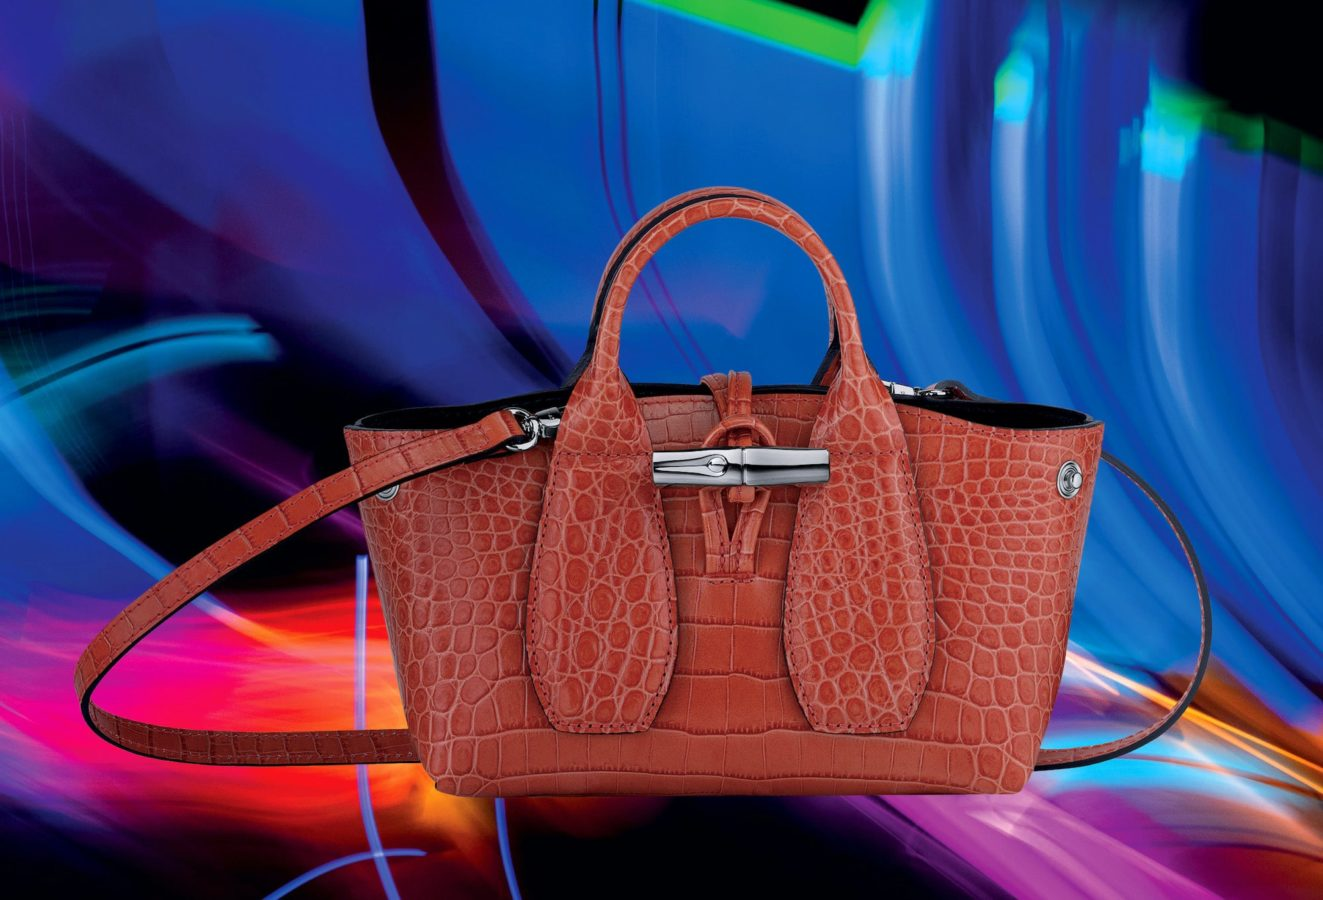 Longchamp Spring/Summer 2021: The Roseau crossbody bag gets facelift